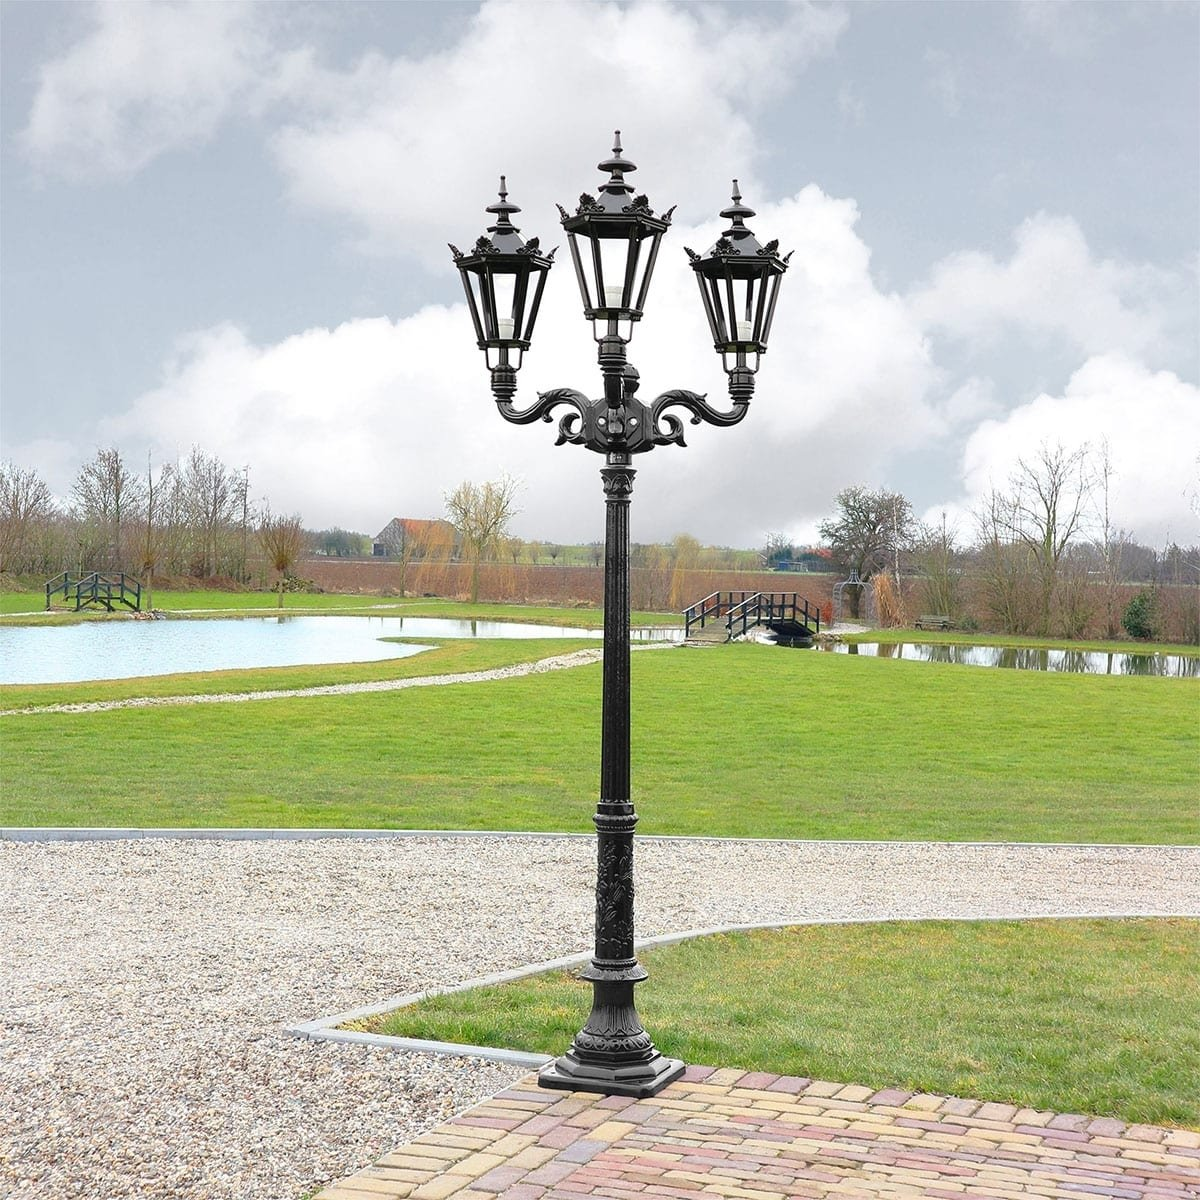 Outdoor Lighting Classic Rural Crown Lantern Eyserheide 3-lamps - 253 cmOutdoor Lighting Classic Rural Crown Lantern Eyserheide 3-lamps - 253 cm